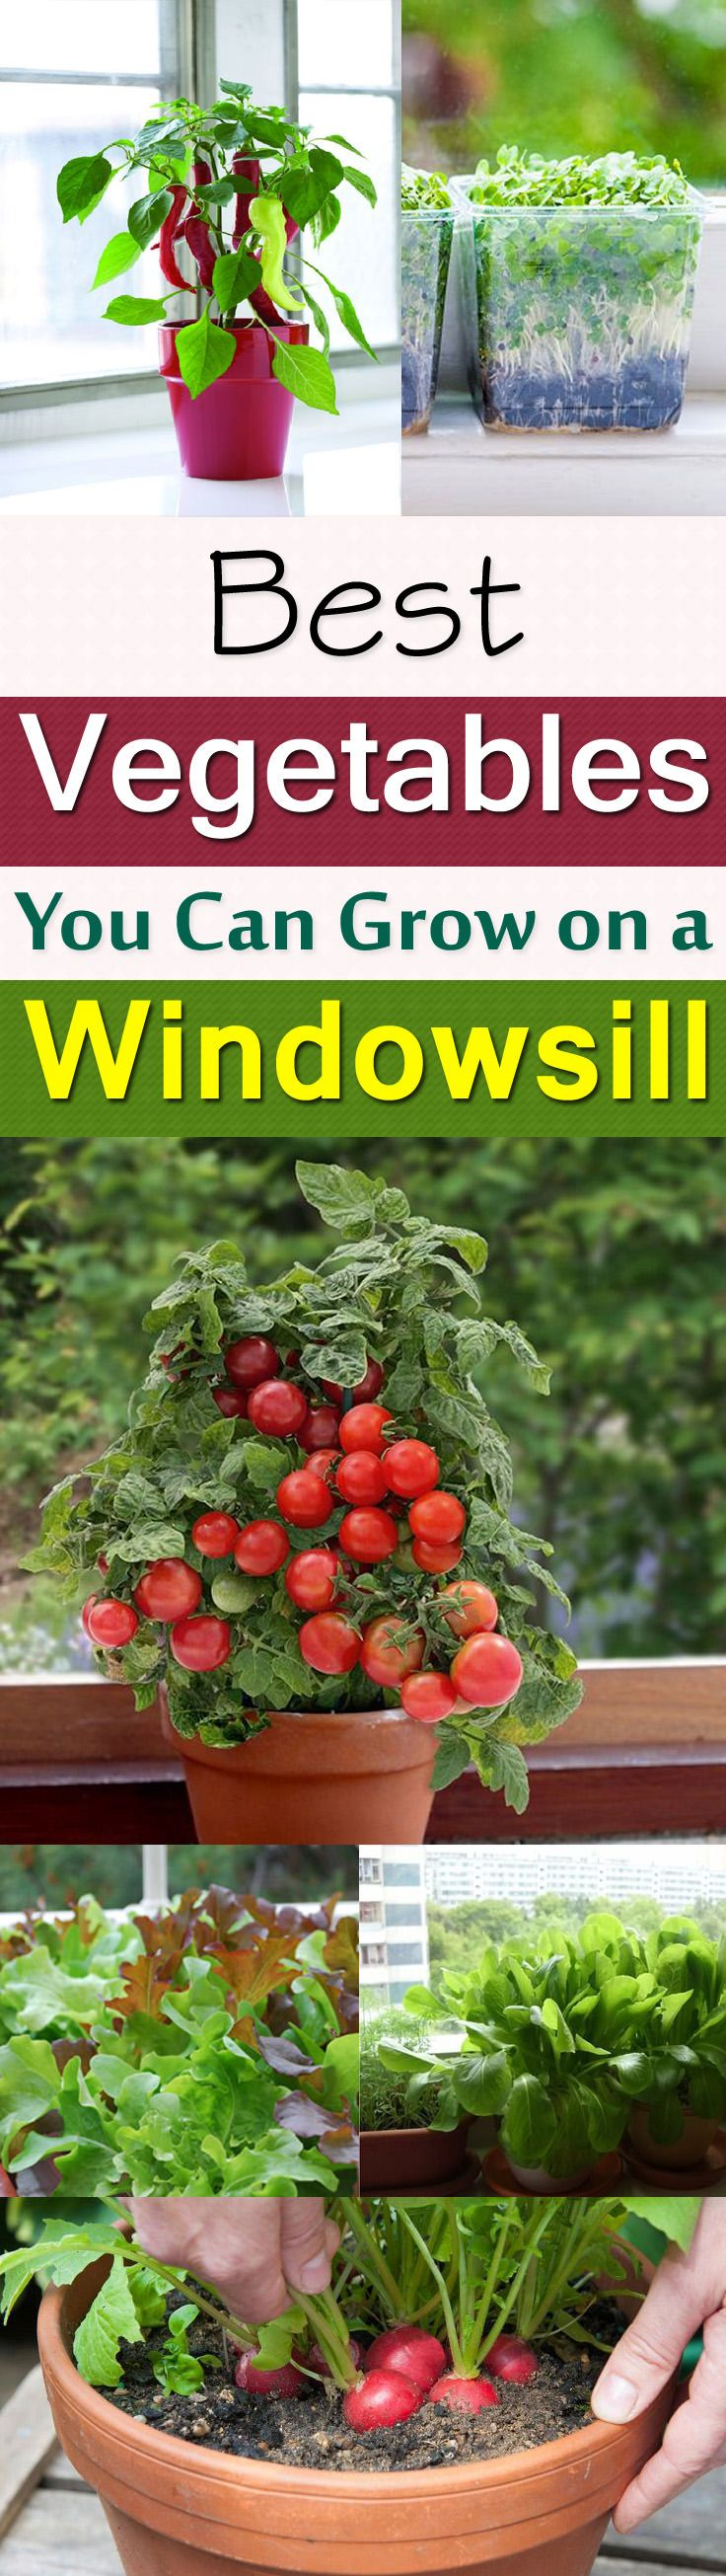 Organic vegetable gardens - 11 Best Vegetables To Grow On Windowsill Indoor Gardeningorganic